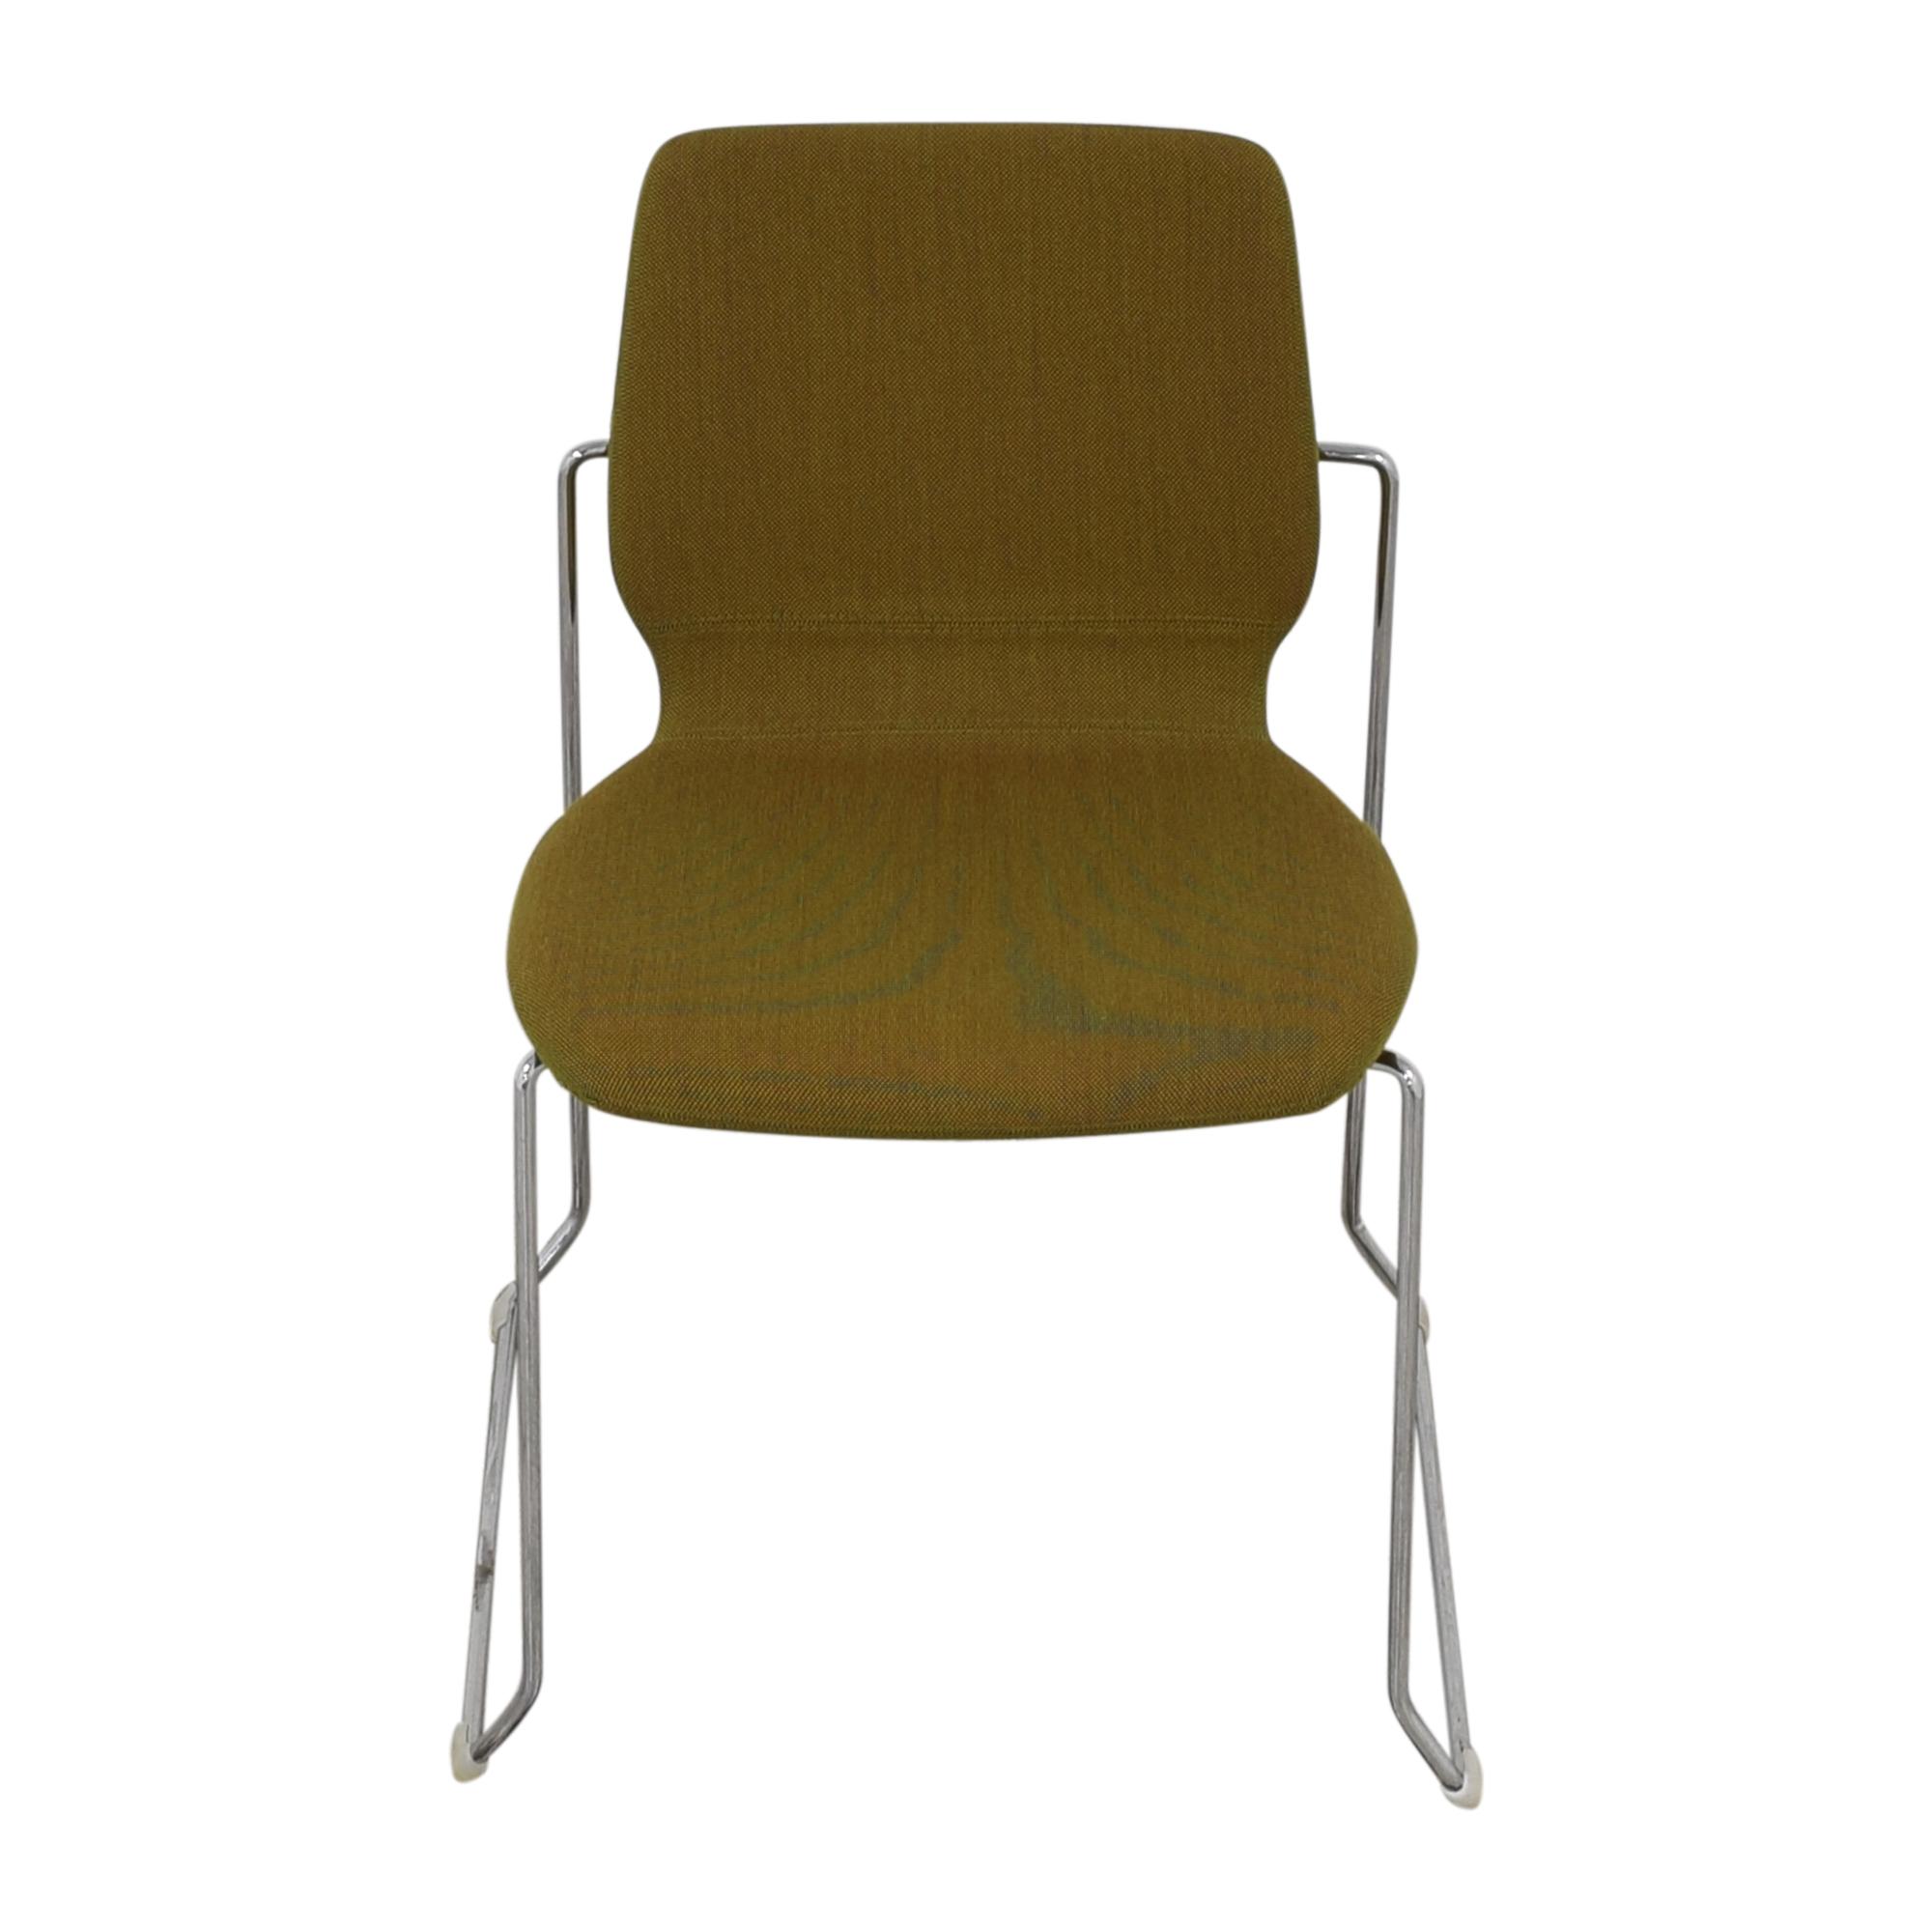 Koleksiyon Koleksiyon Asanda Armless Chair pa